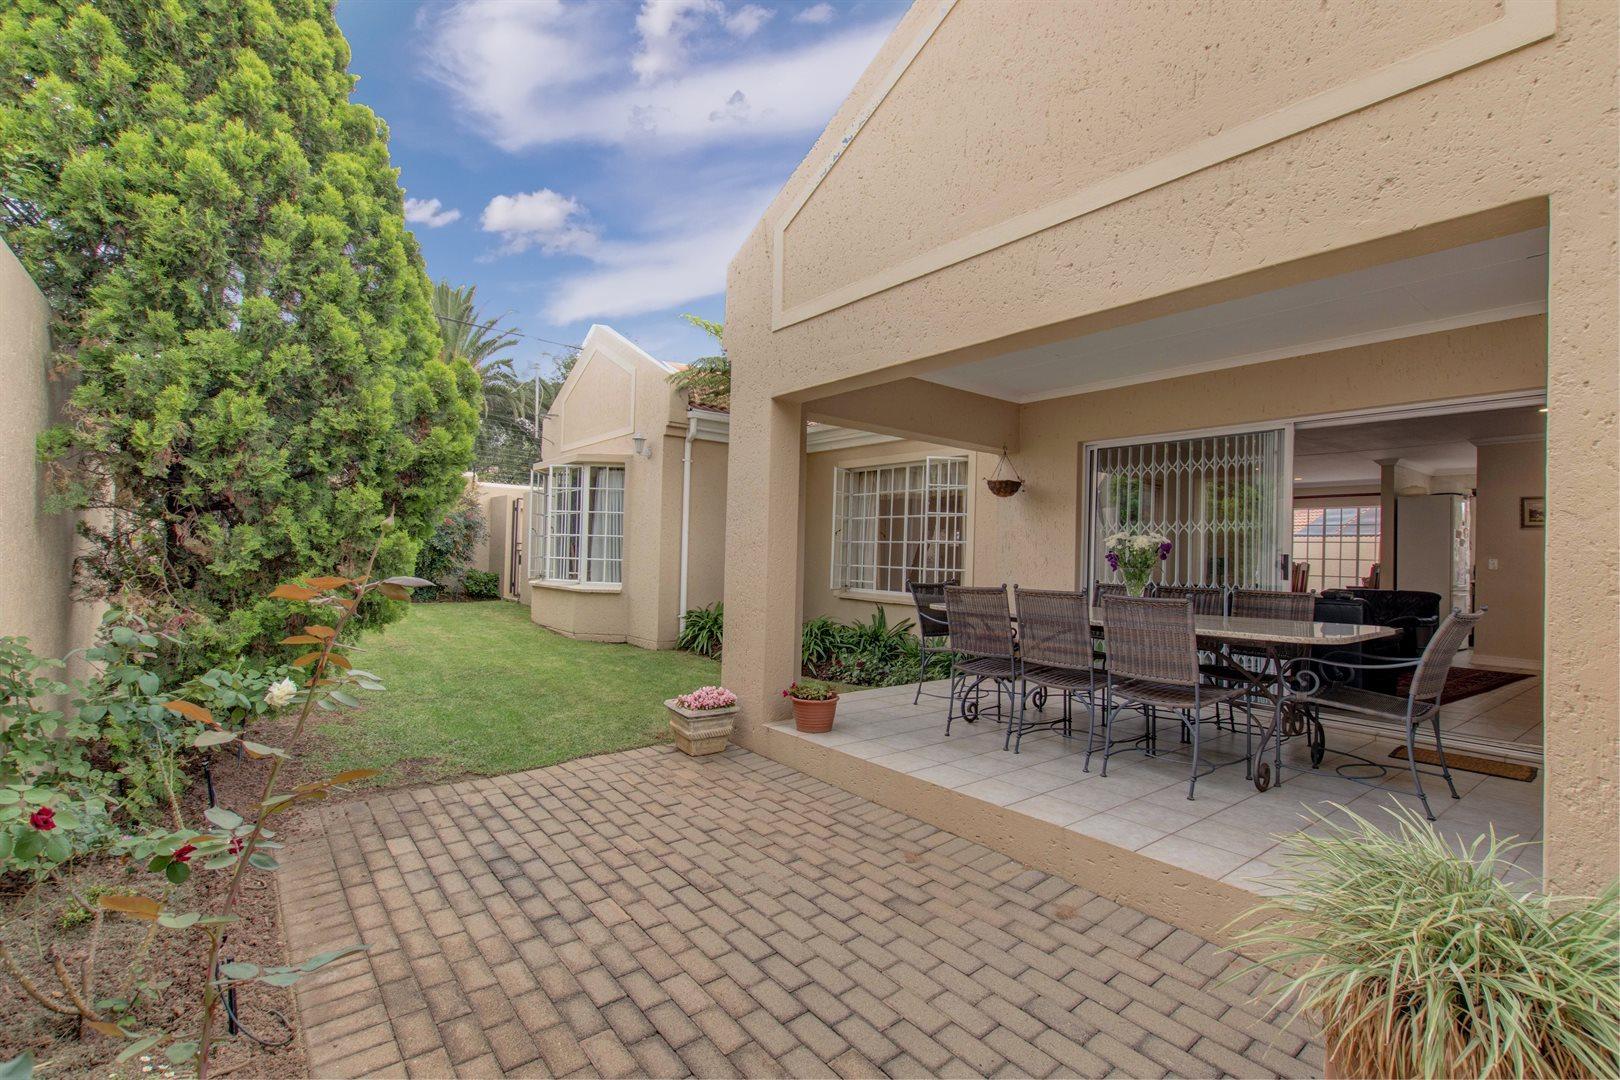 Sandton, Douglasdale Property  | Houses For Sale Douglasdale, Douglasdale, House 3 bedrooms property for sale Price:1,699,000